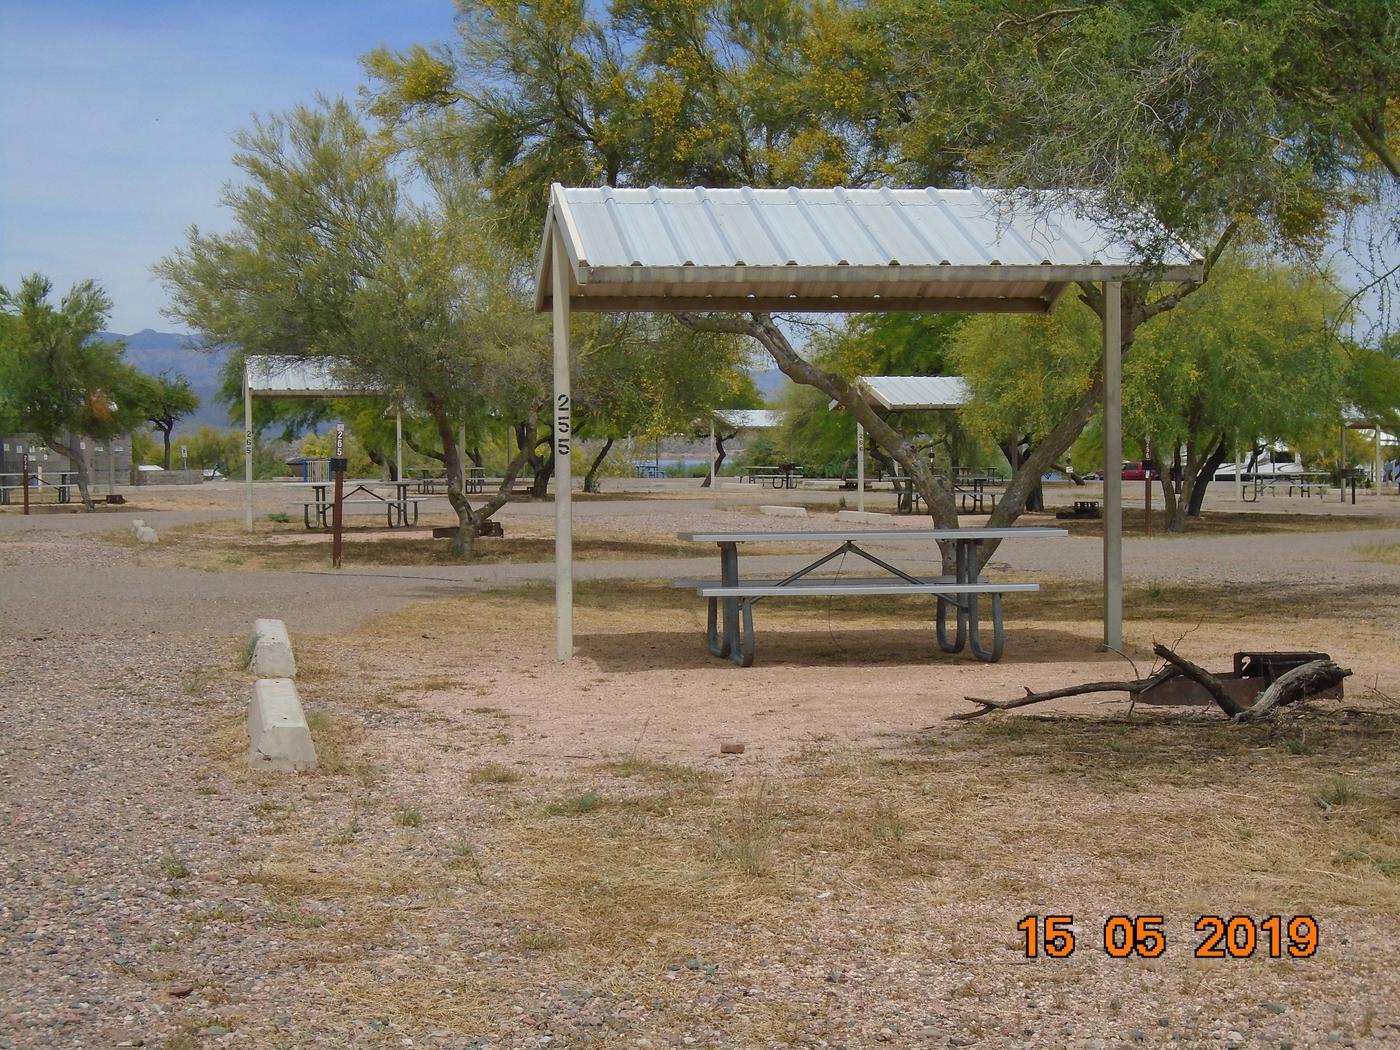 Campsite 255Windy Hill Campground